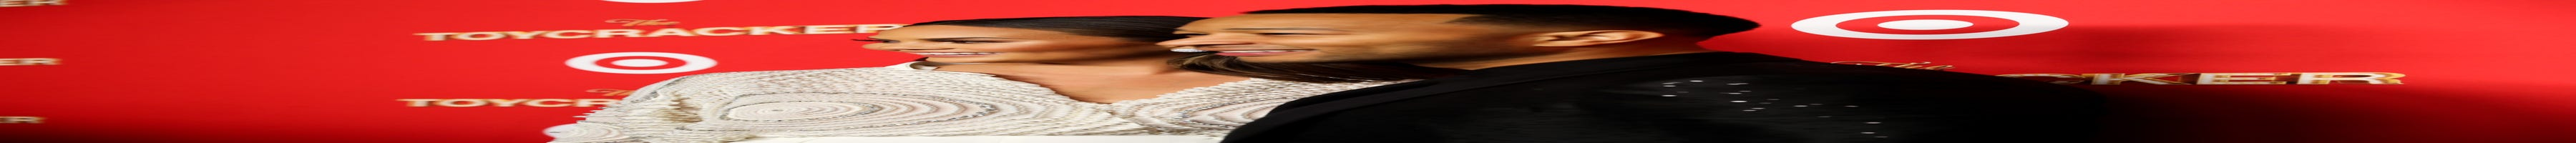 Watch Chrissy Teigen and John Legend's glorious rap battle for Target